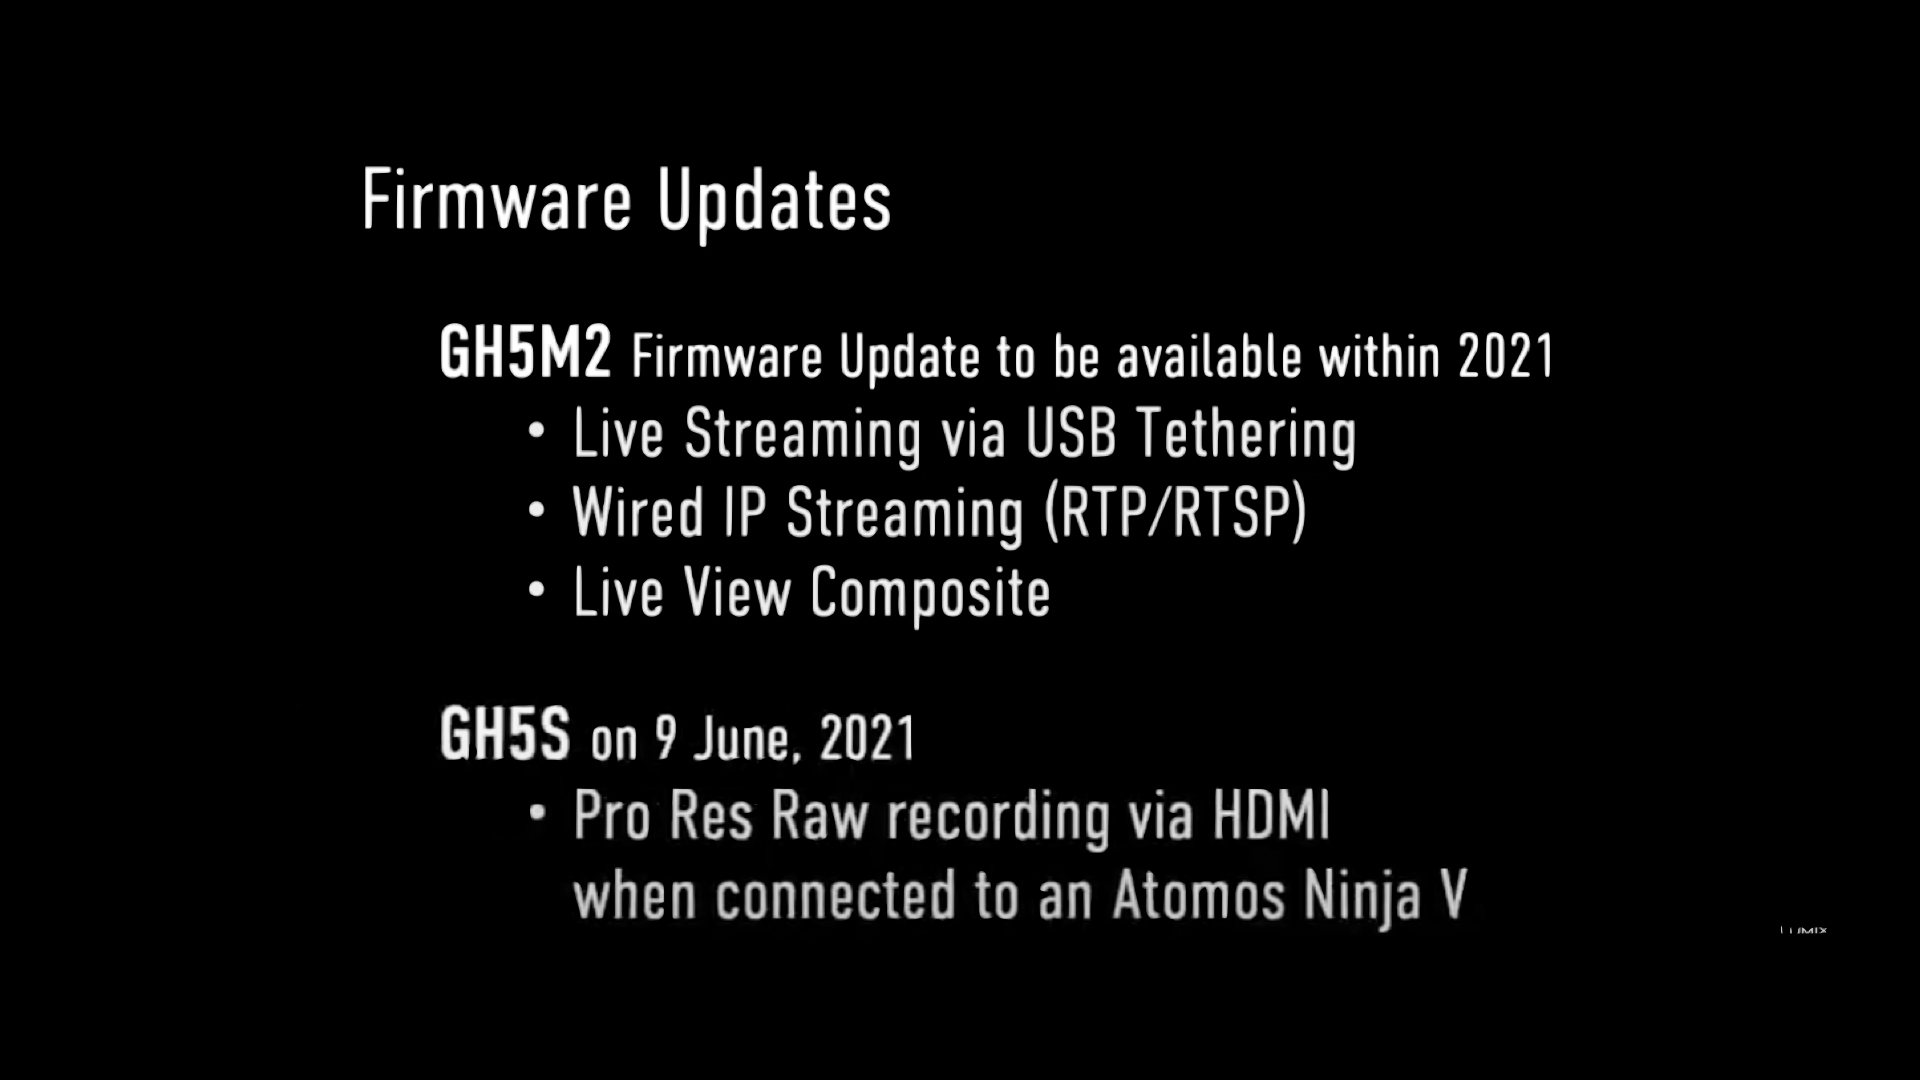 Les prochains updates firmware Panasonic Lumix -  GH5 M2